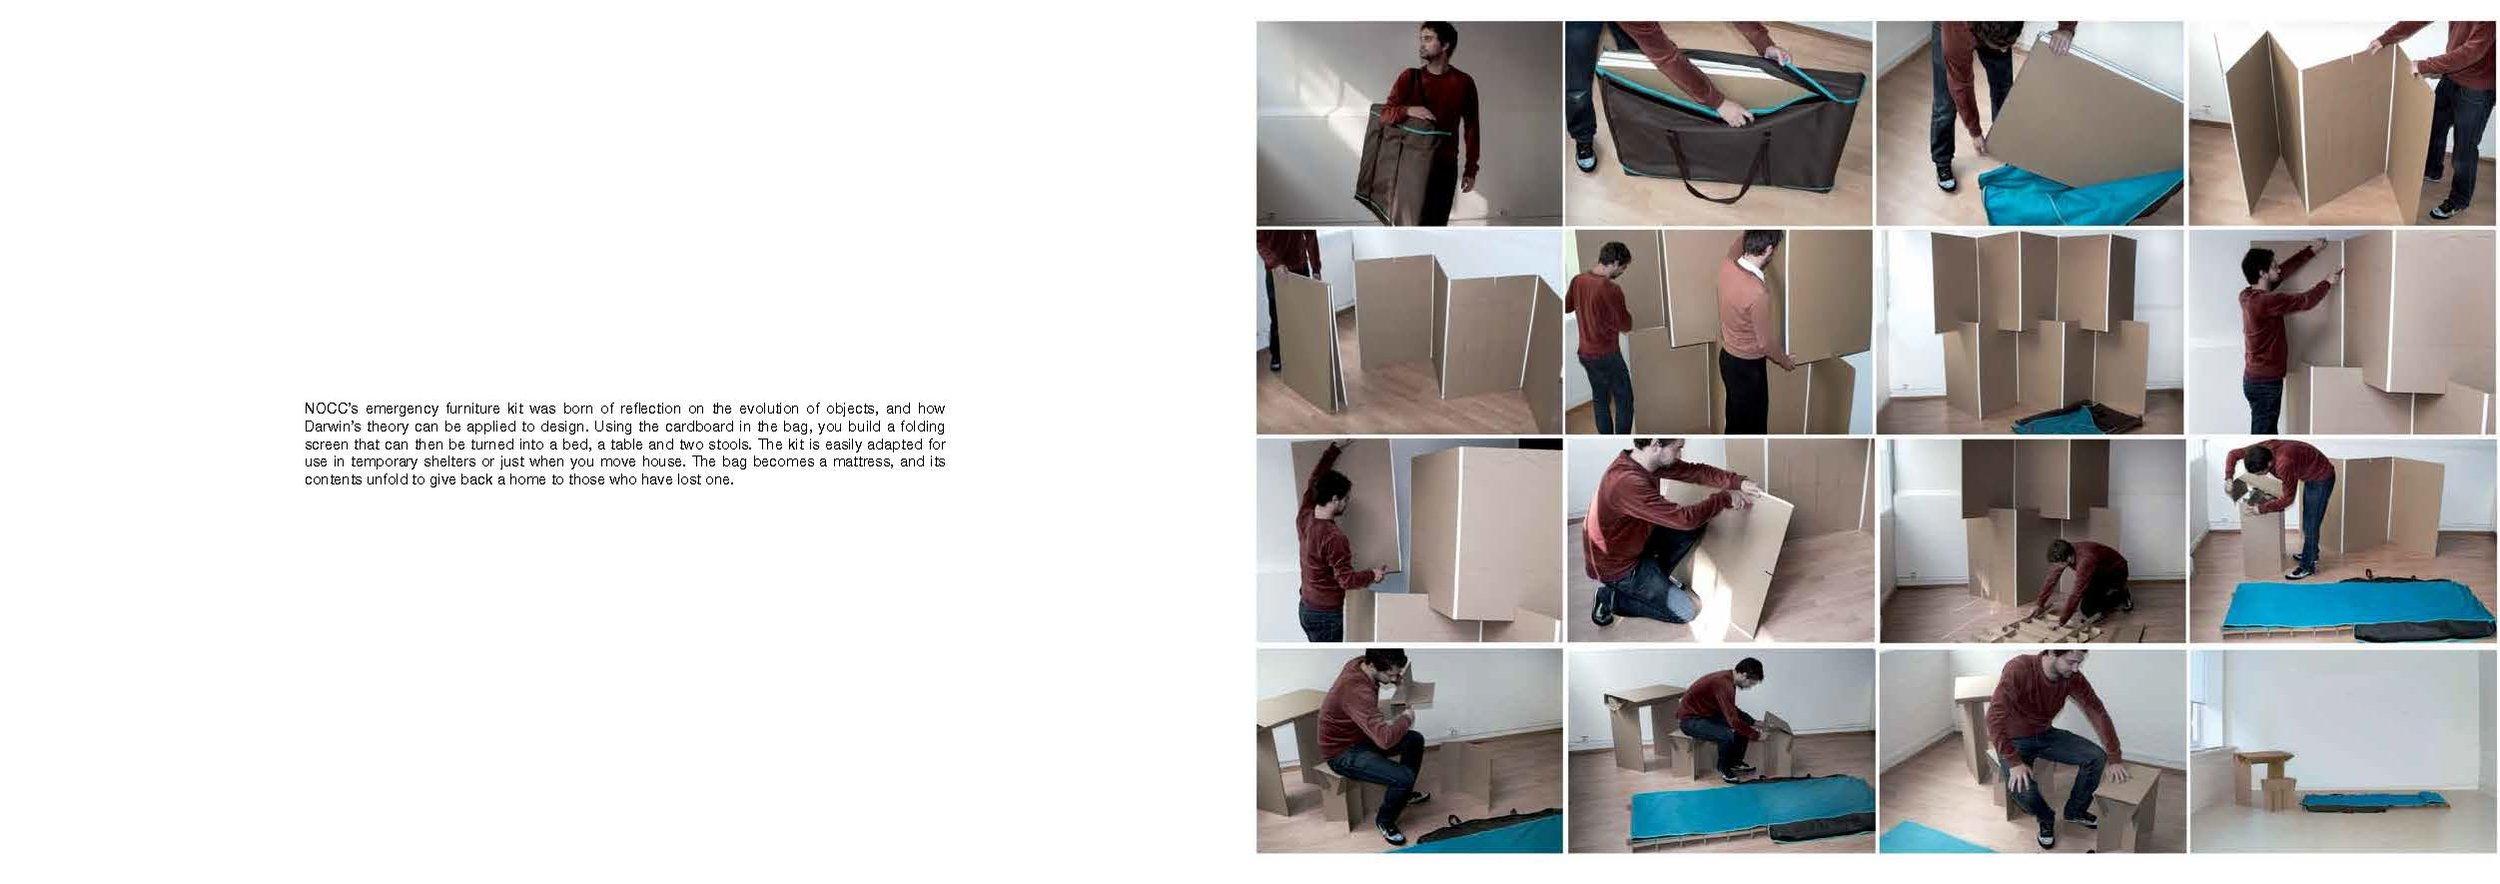 MANIFESTO MASTER FILE 221214 _Page_082.jpg